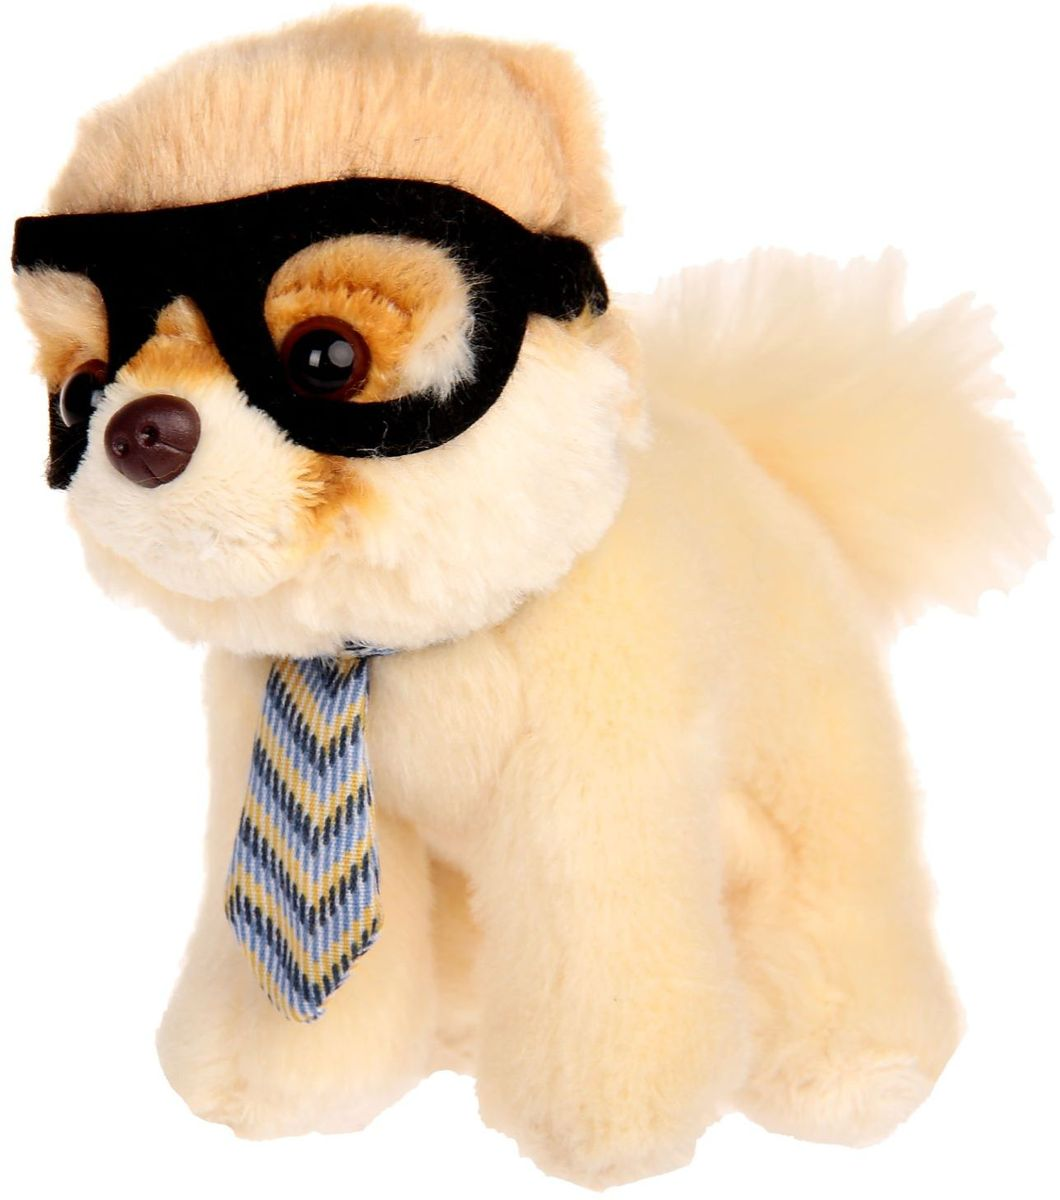 Gund Мягкая игрушка Собака Itty Bitty Boo Nerdy 12,5 см 2245512 радомир мягкая игрушка собака соня 55 см 2008906